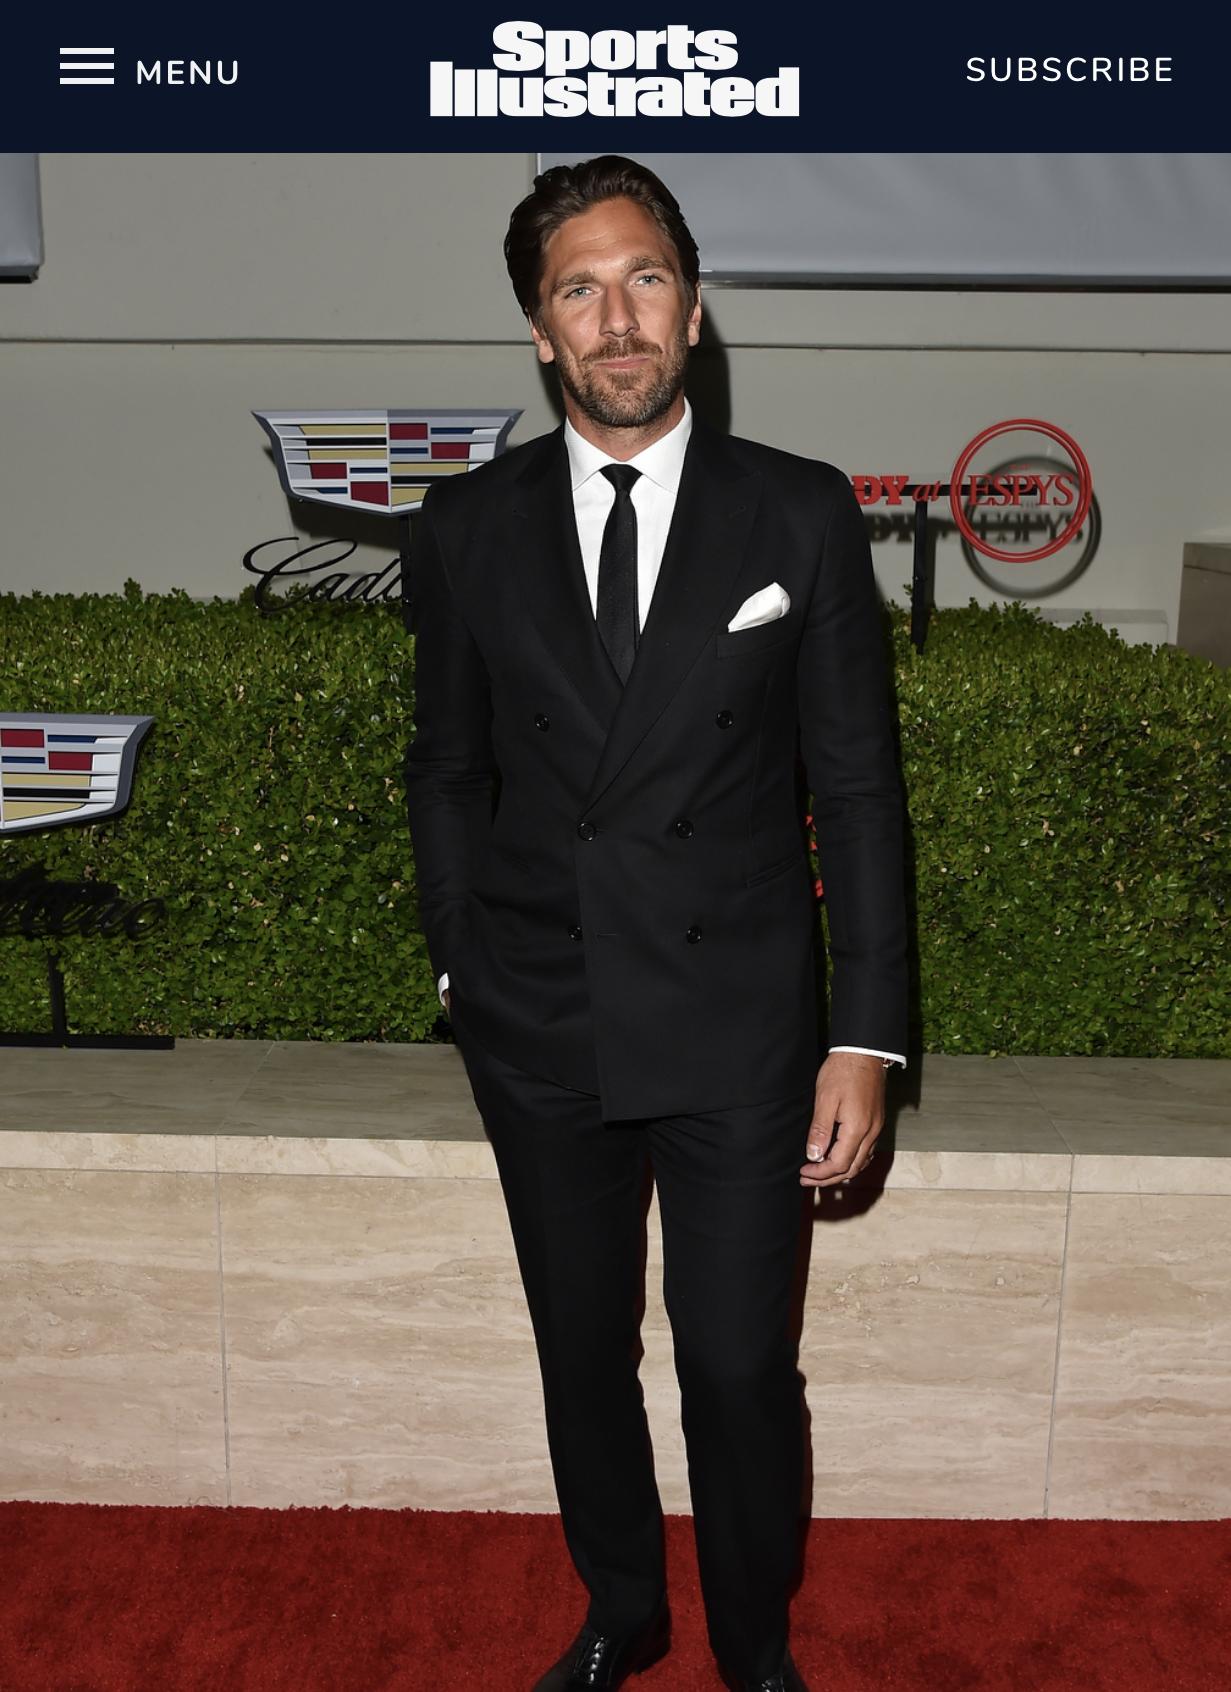 Henrik Lundqvist 6 On Sports Illustrated Fashionable 50 List